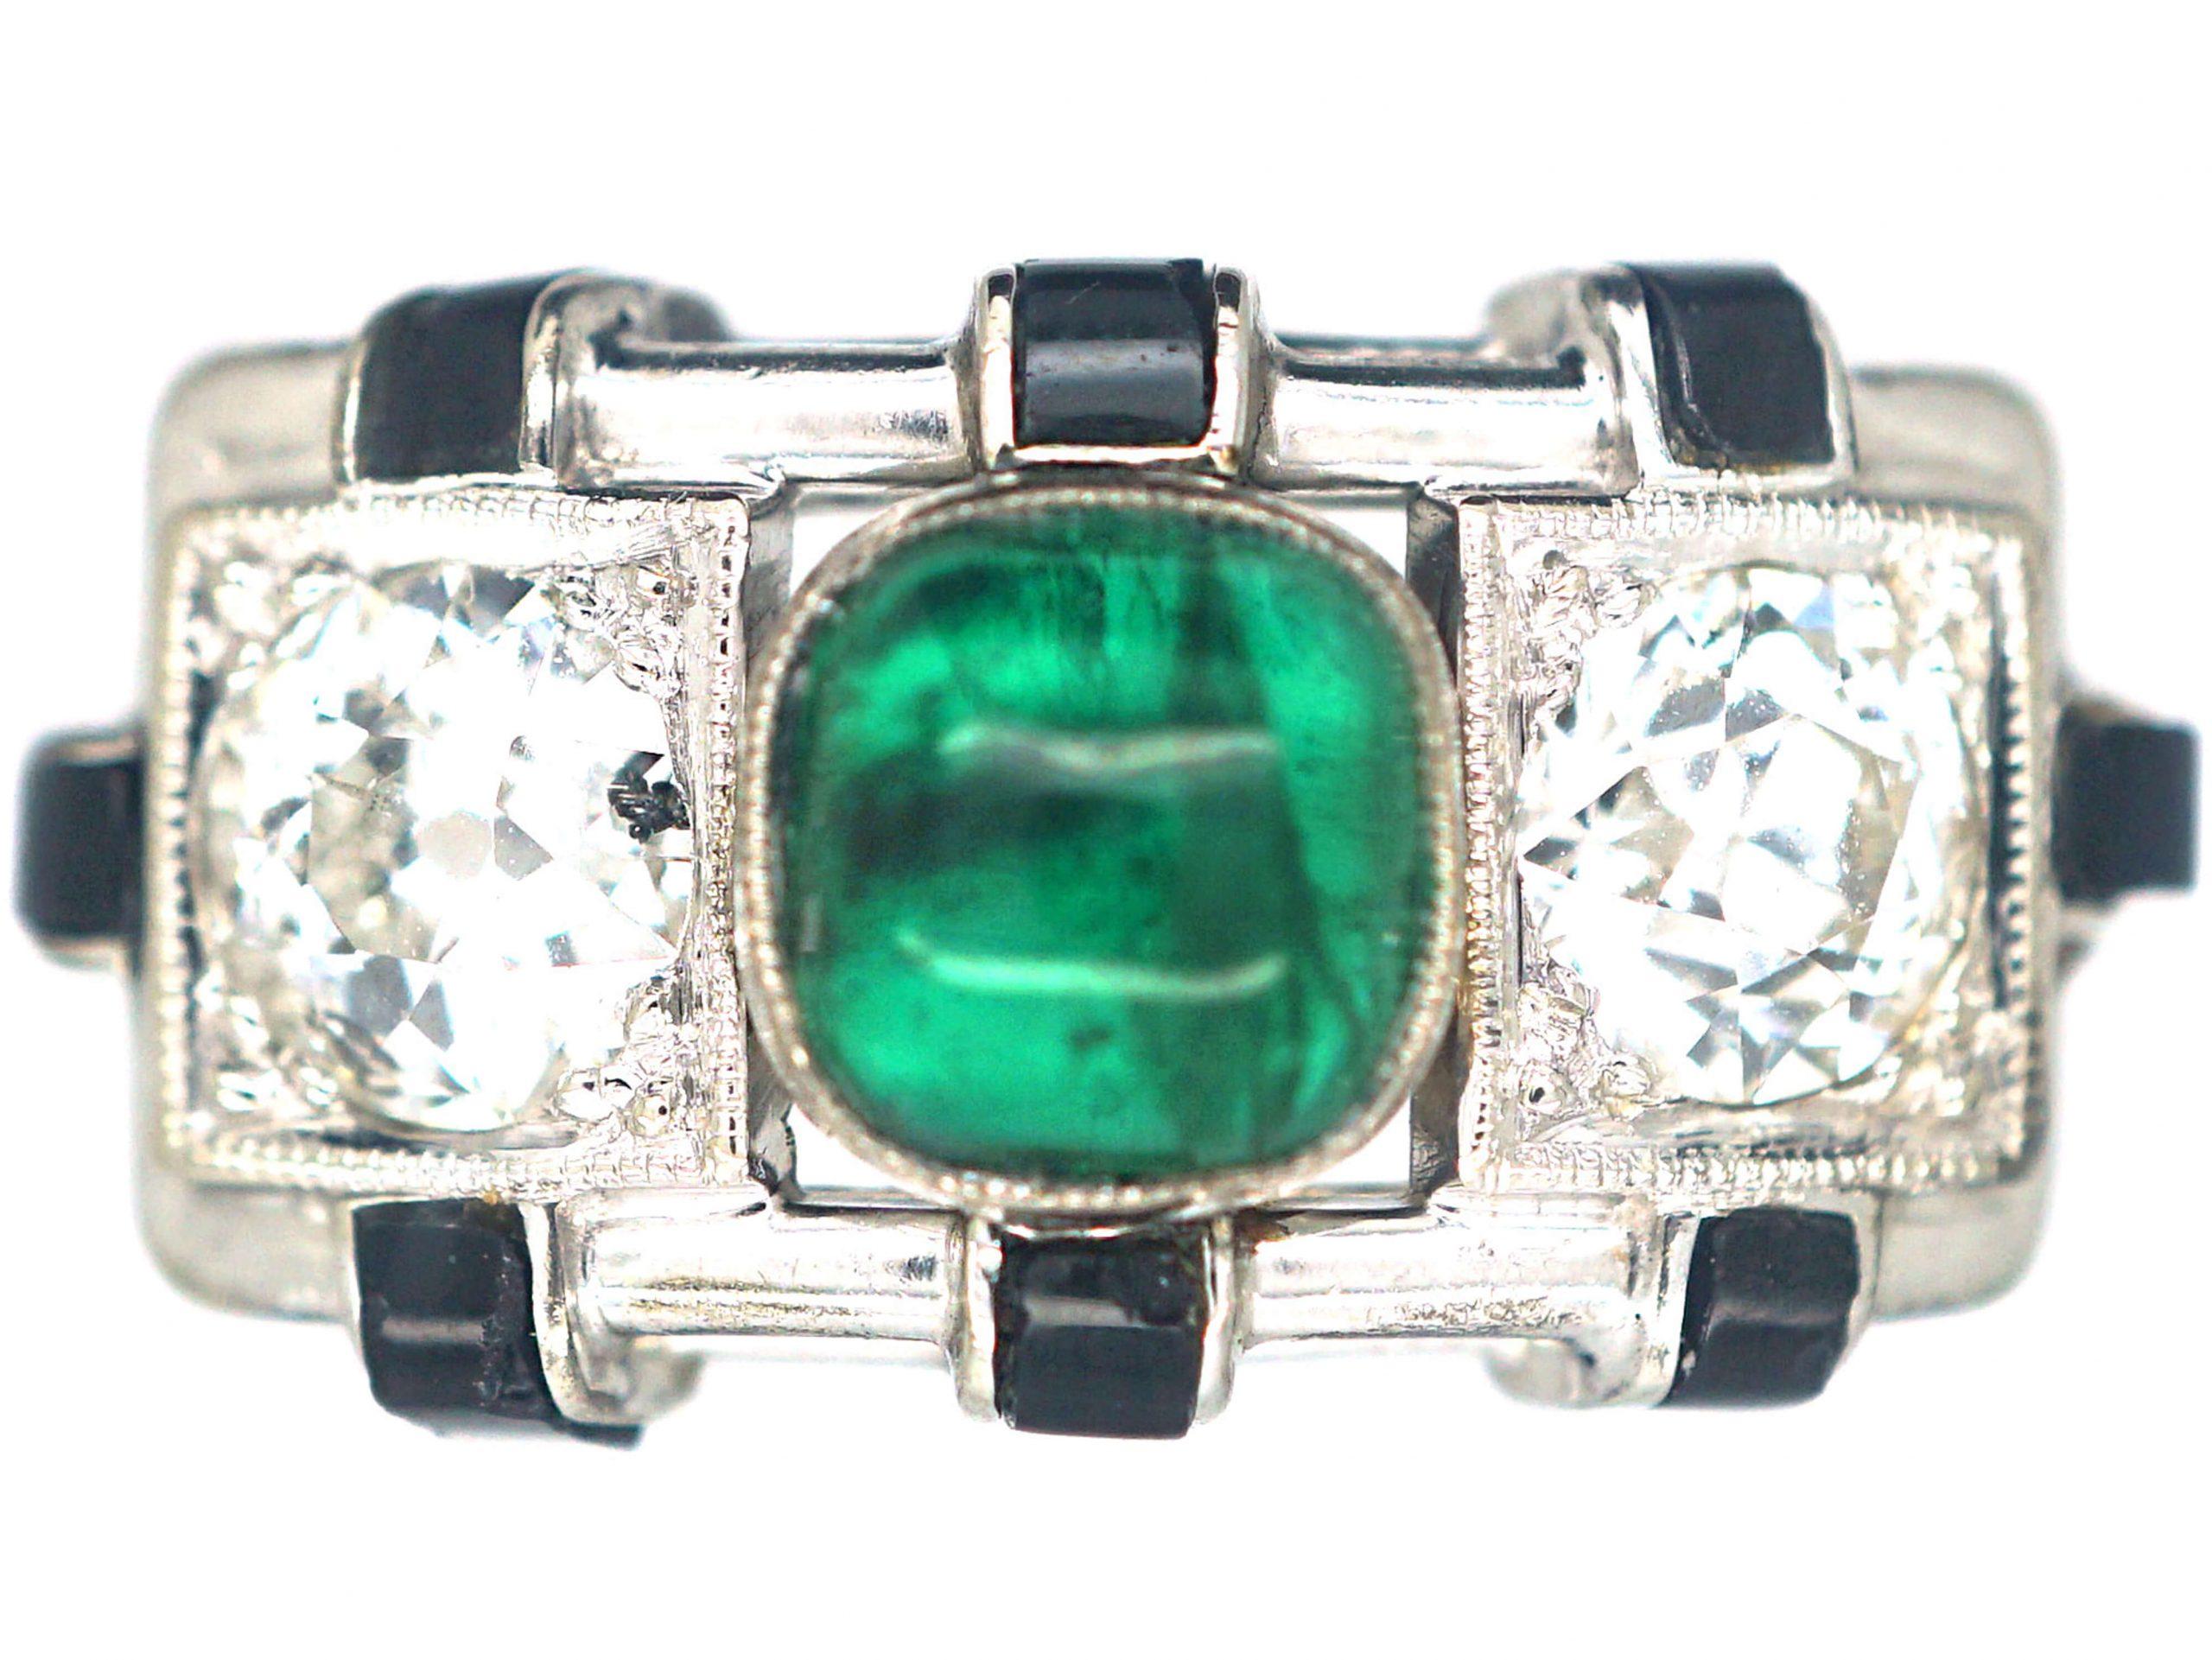 Art Deco 14ct White Gold, Cabochon Emerald , Onyx & Diamond Geometric Ring